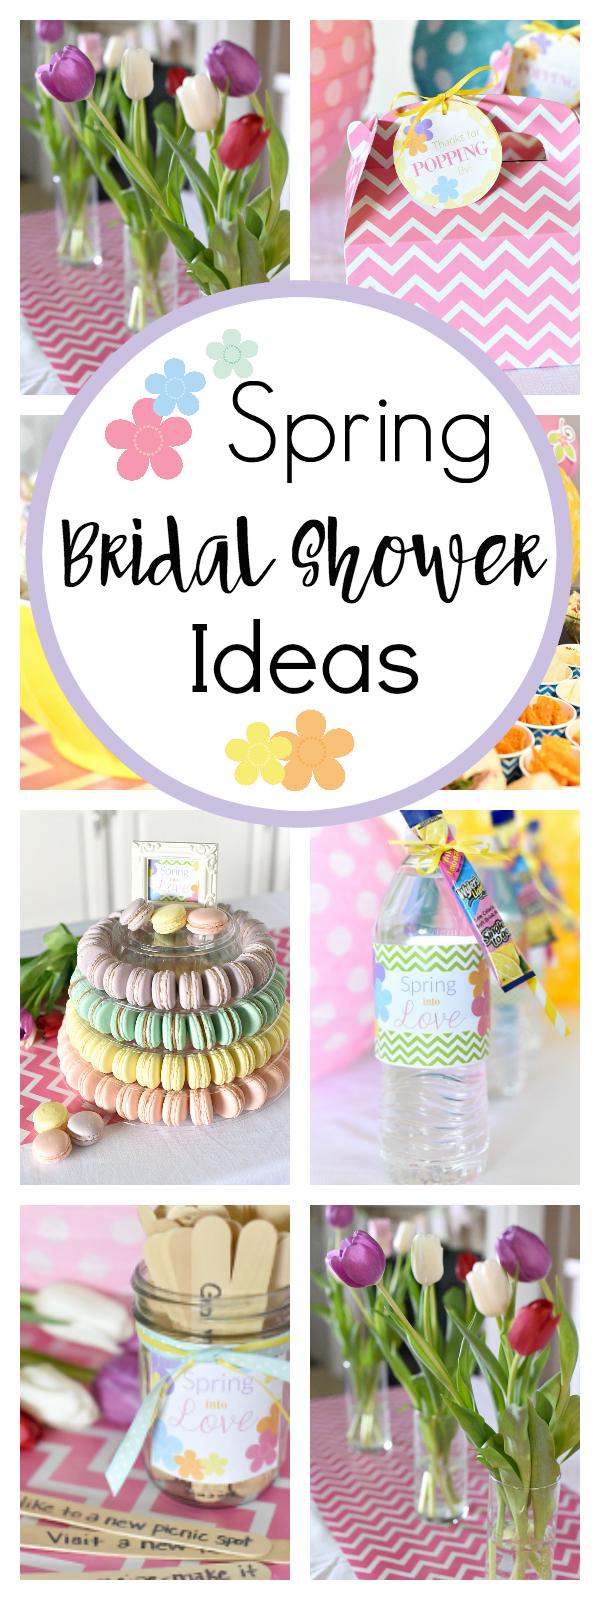 Bridal Shower Ideas-Game, Favors, Invitations